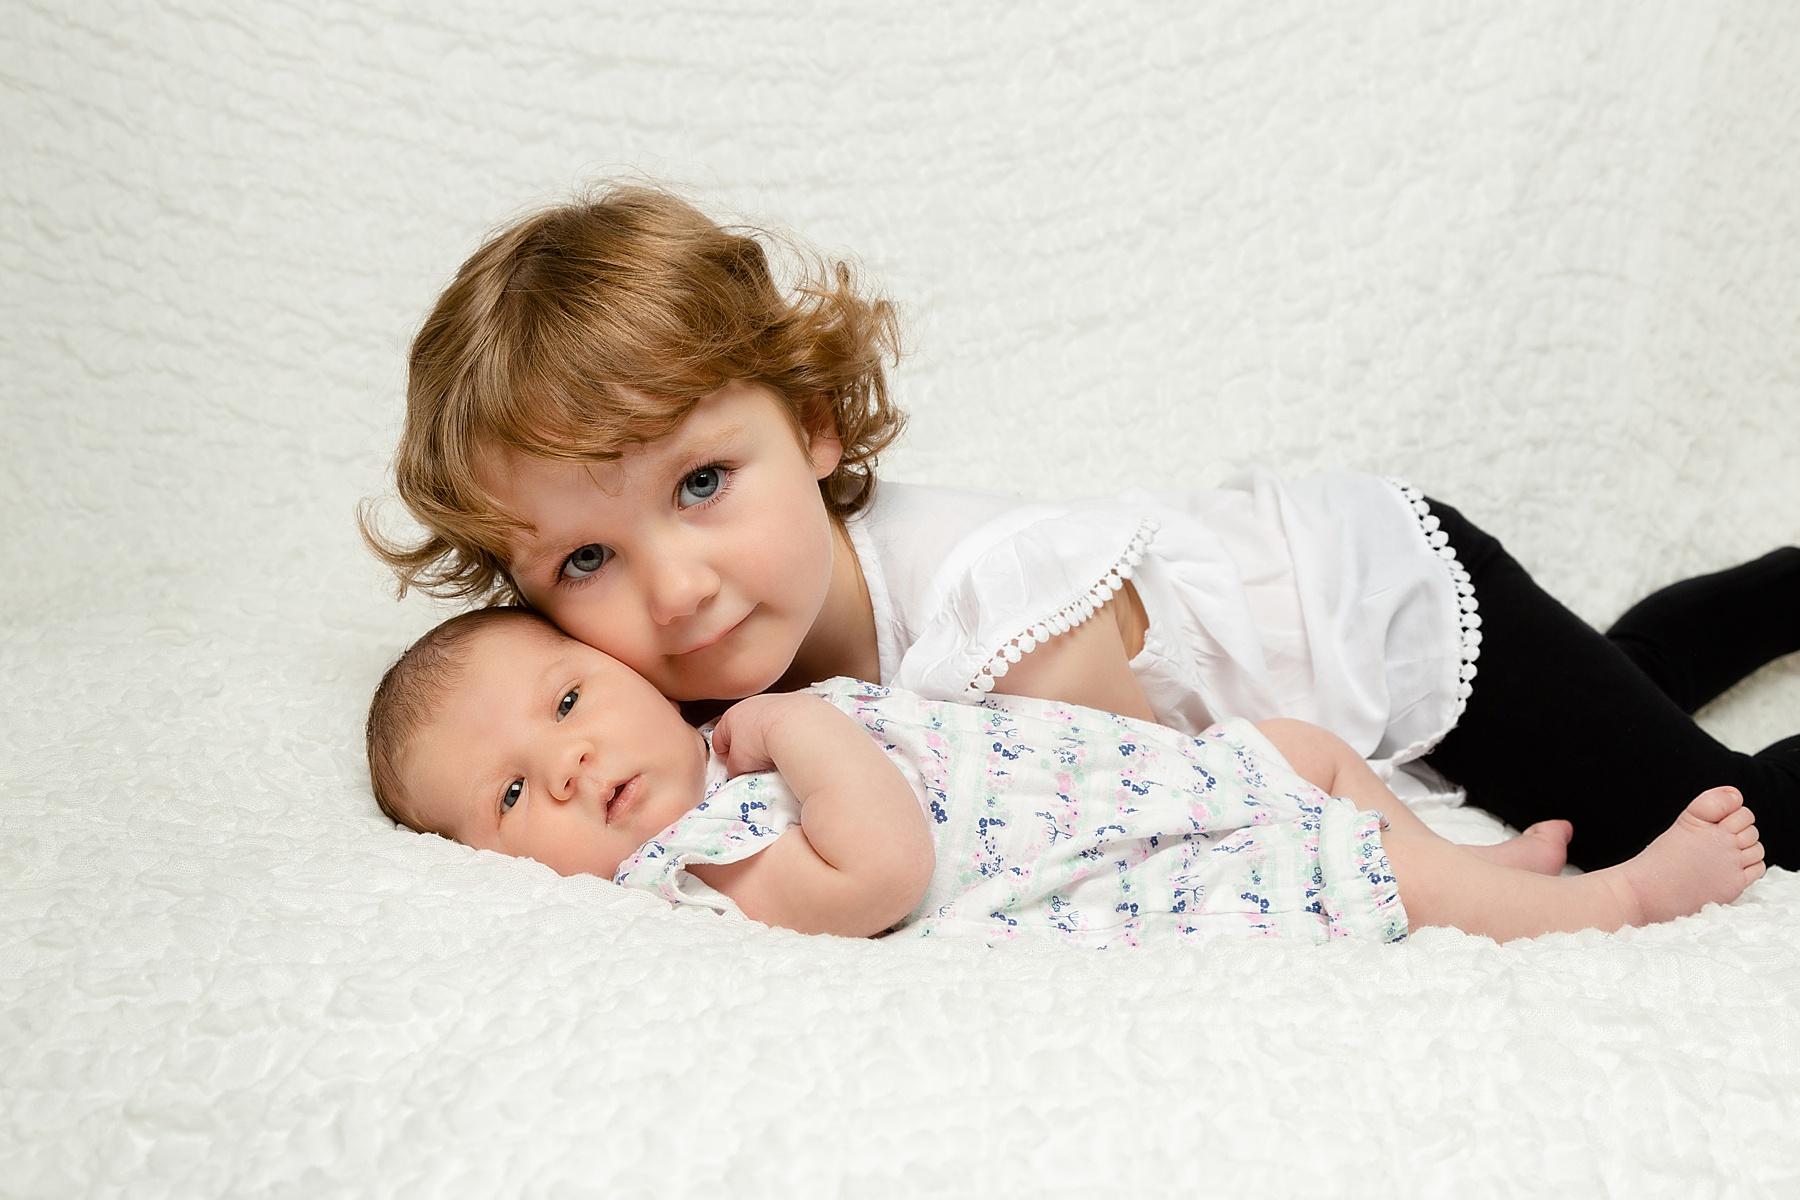 newborn photography with sibling edinburgh